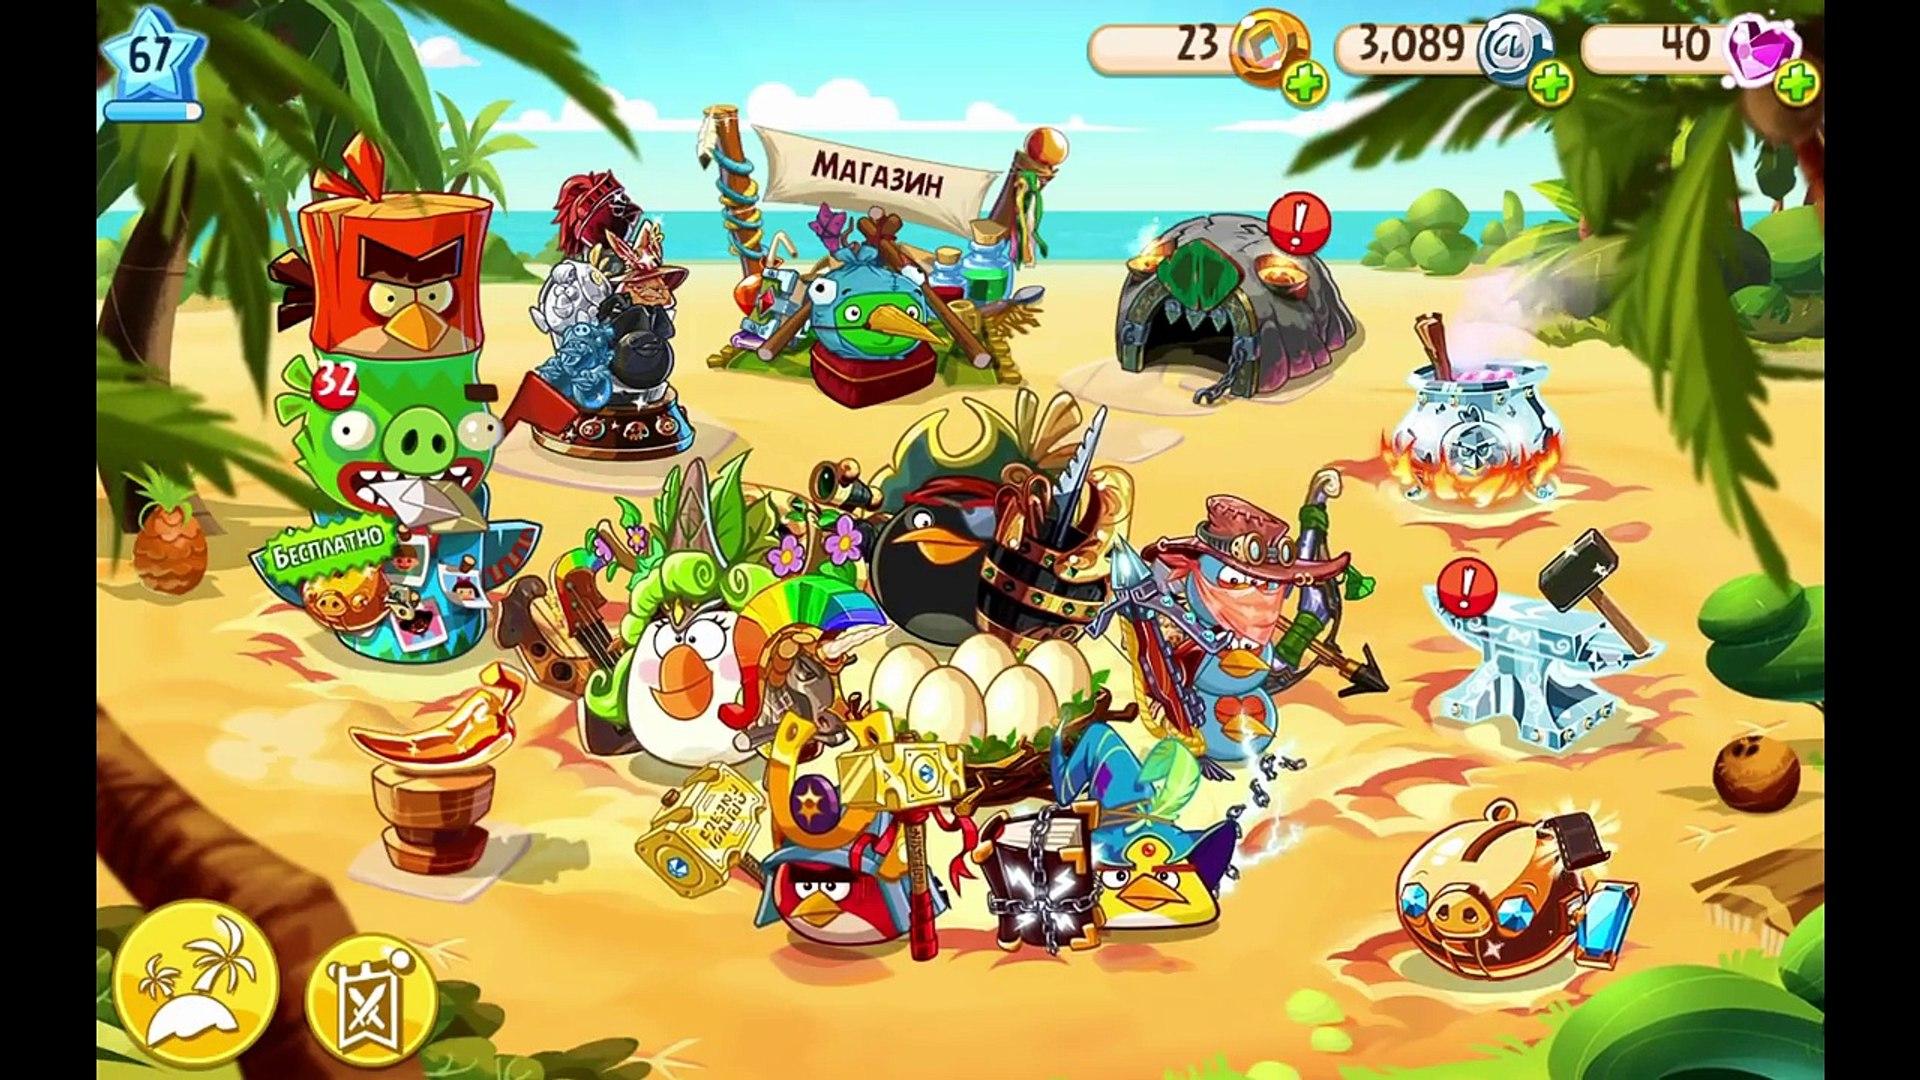 Angry Birds Epic #333 ДЕНЬ СВЯТОГО ВАЛЕНТИНА Valentines Day event Геймплей Walkthrough